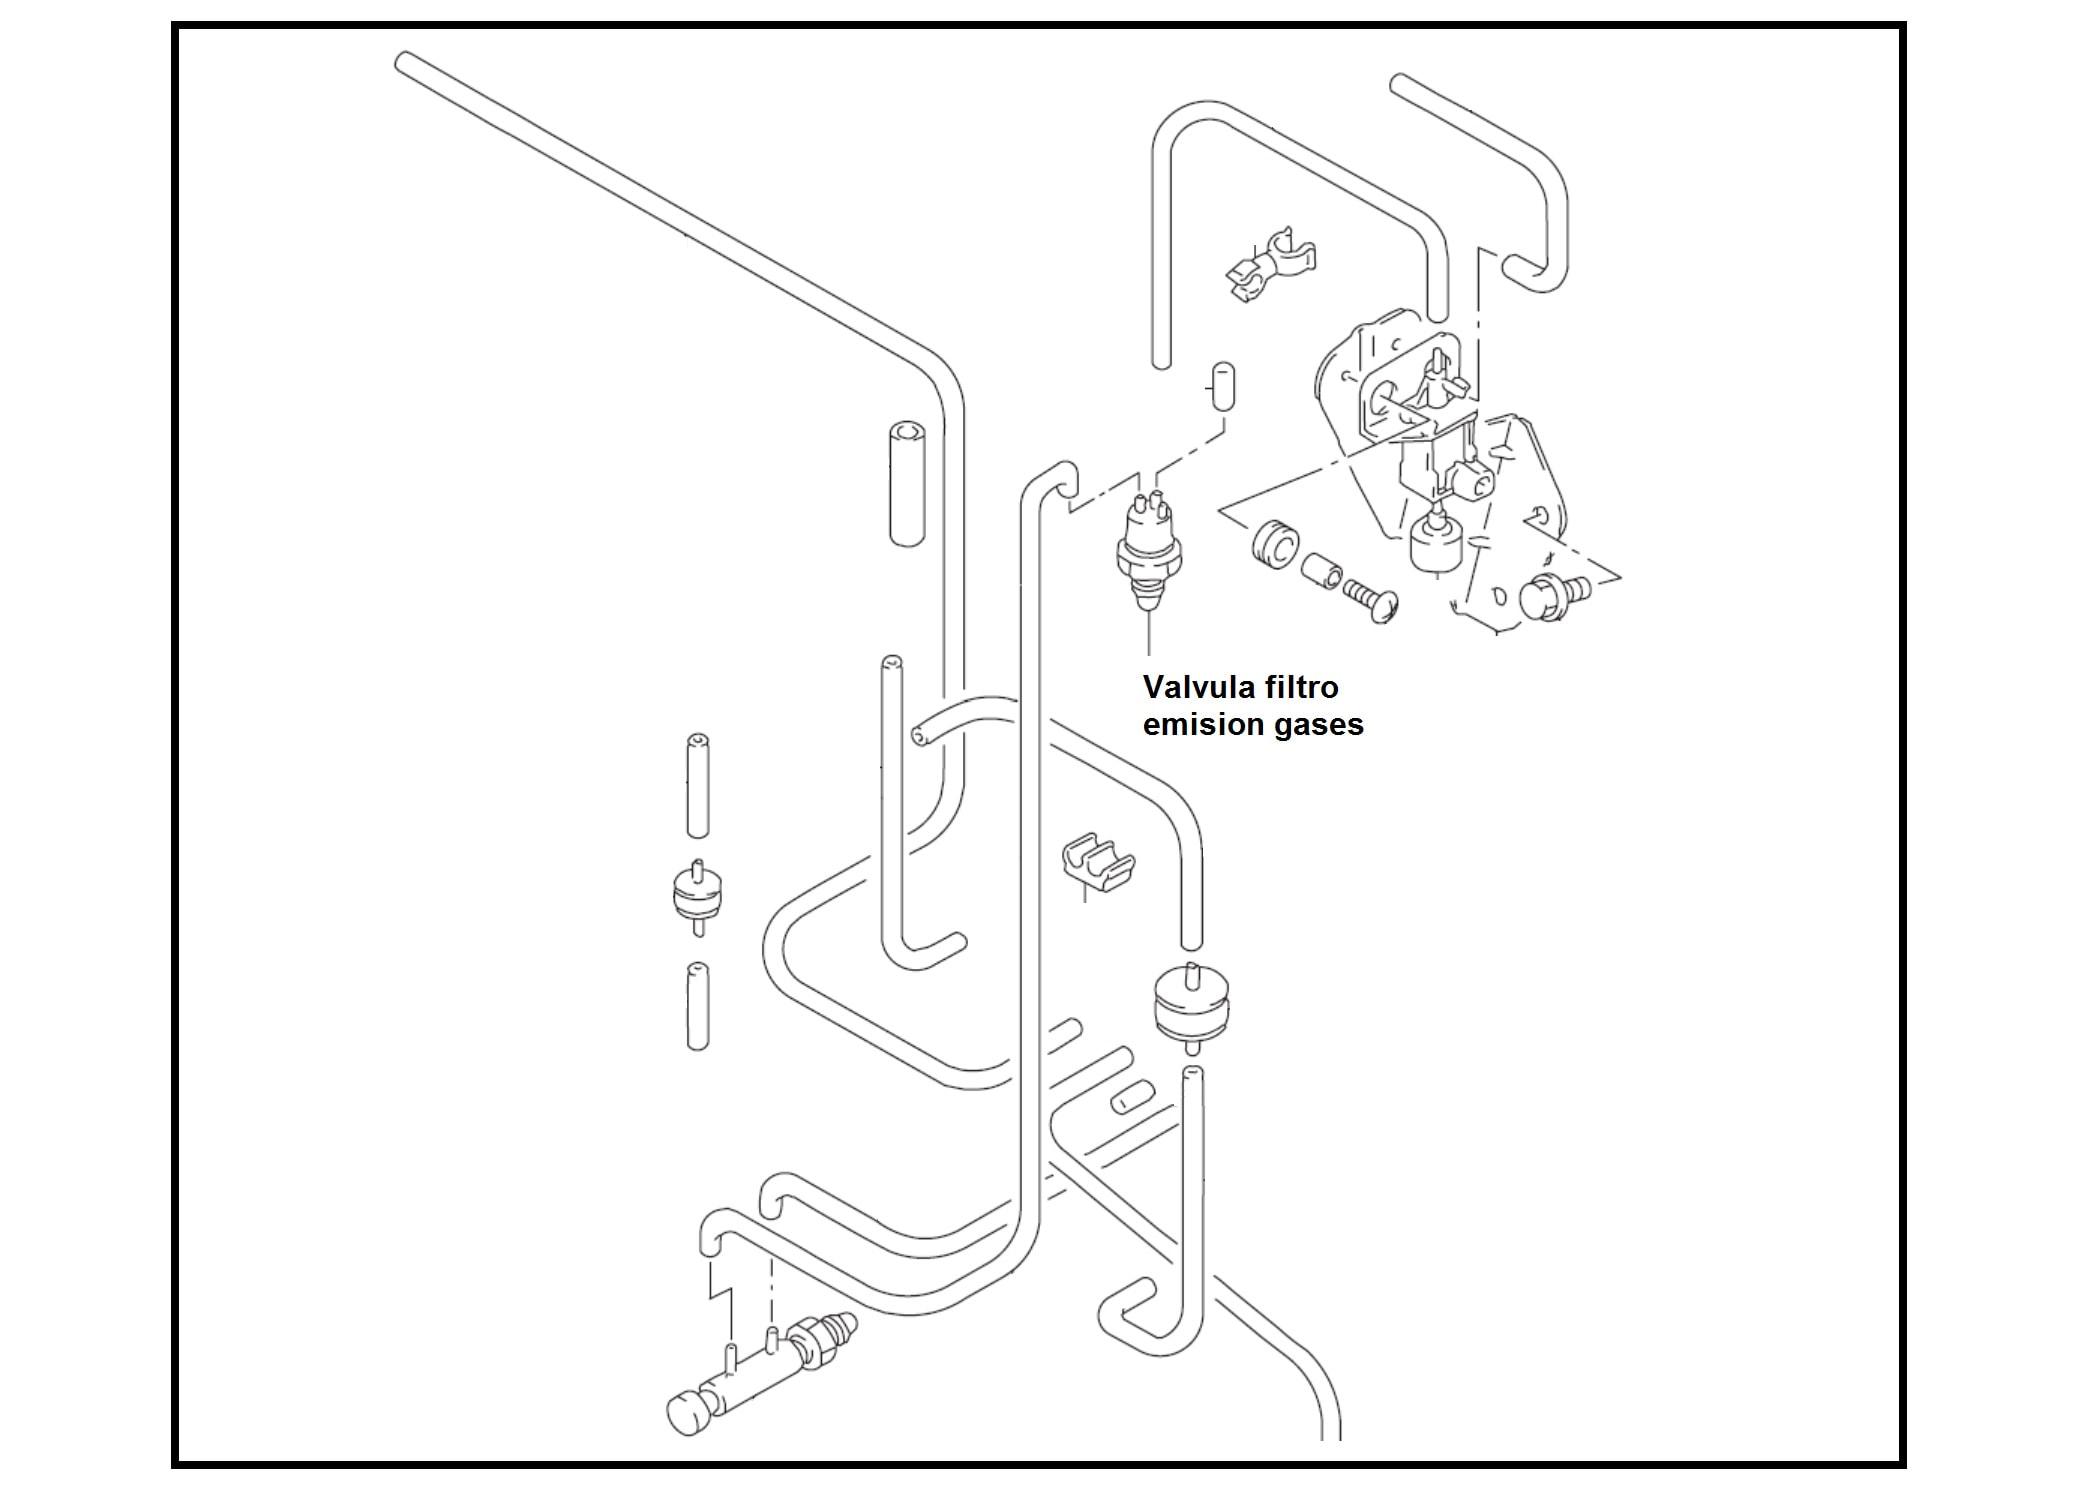 Valvula Filtro Emision Gases Chevrolet Swift